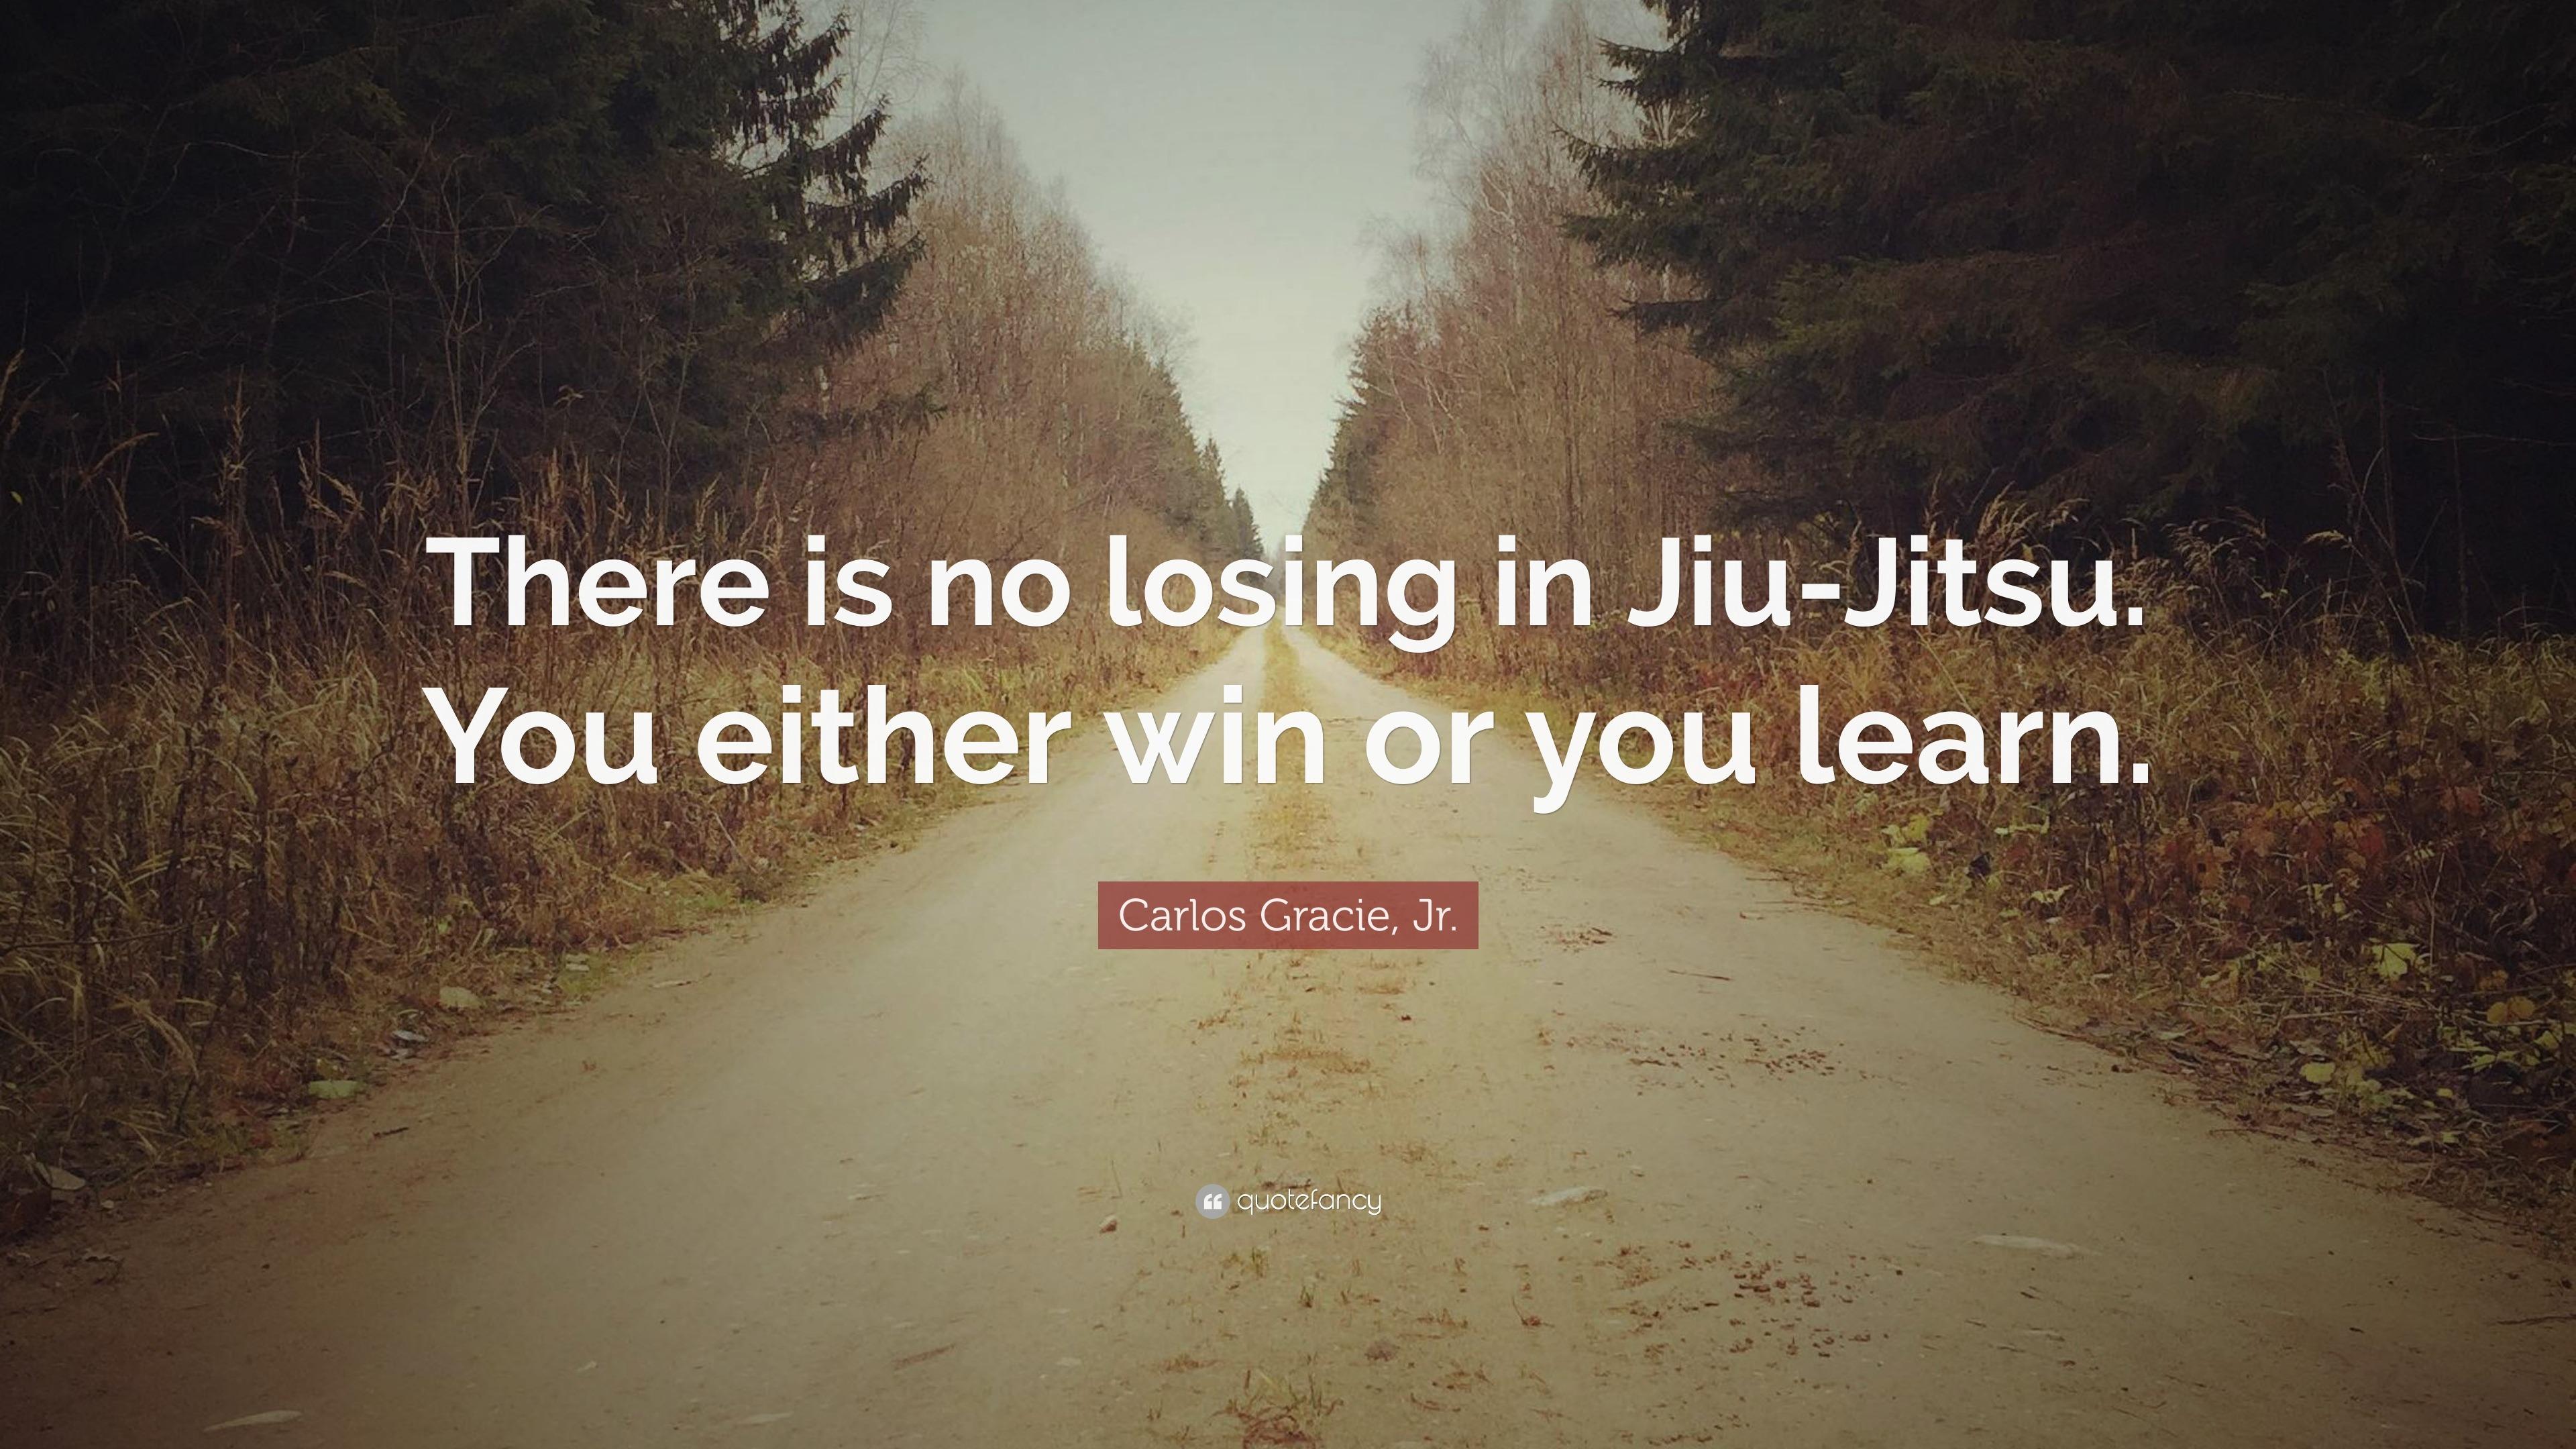 Carlos gracie jr quote there is no losing in jiu jitsu you carlos gracie jr quote there is no losing in jiu jitsu voltagebd Image collections